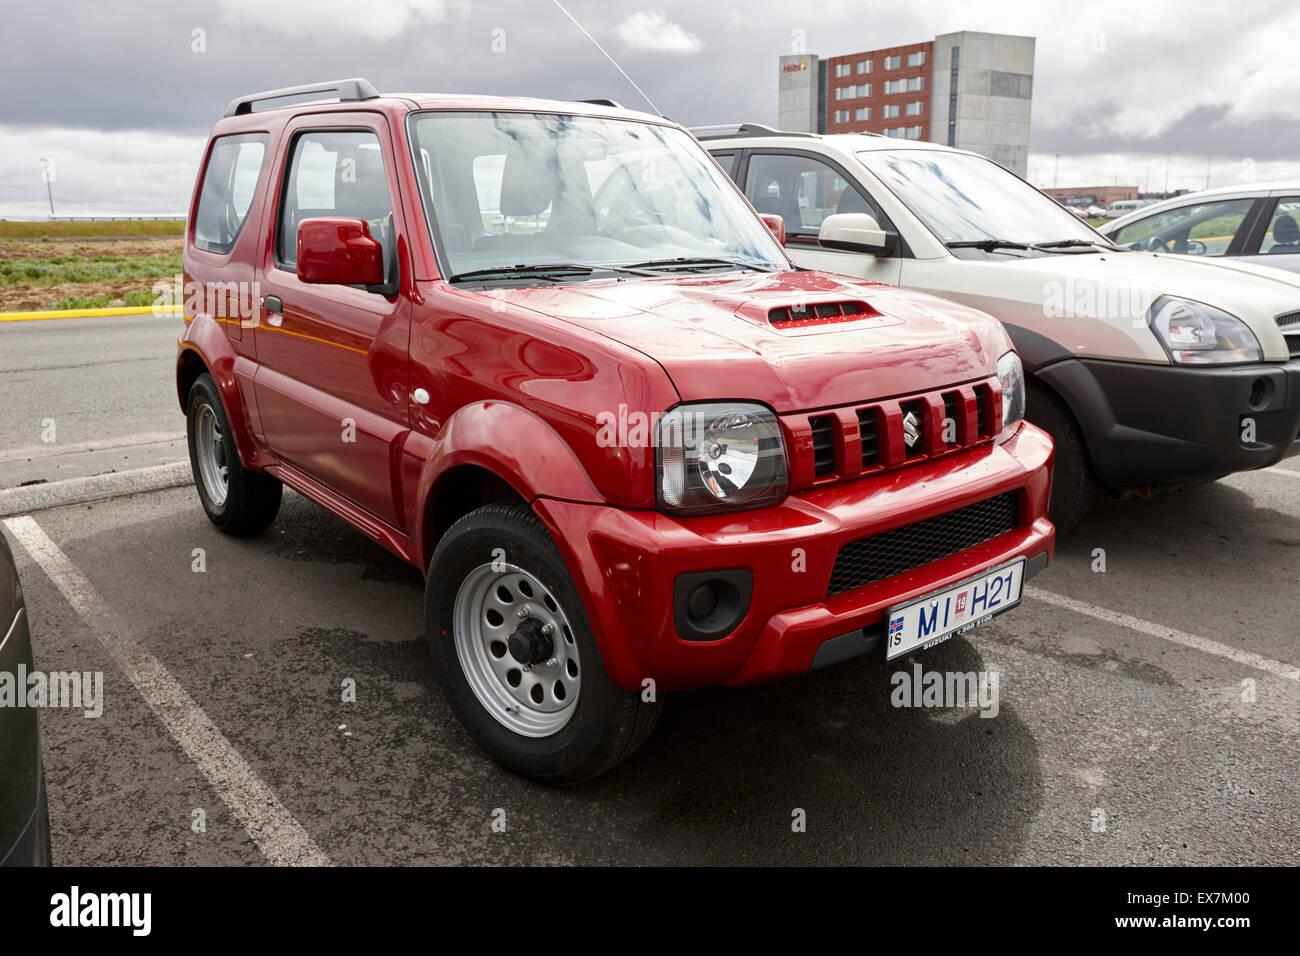 red suzuki jimny jeep hire car at keflavik airport iceland. Black Bedroom Furniture Sets. Home Design Ideas